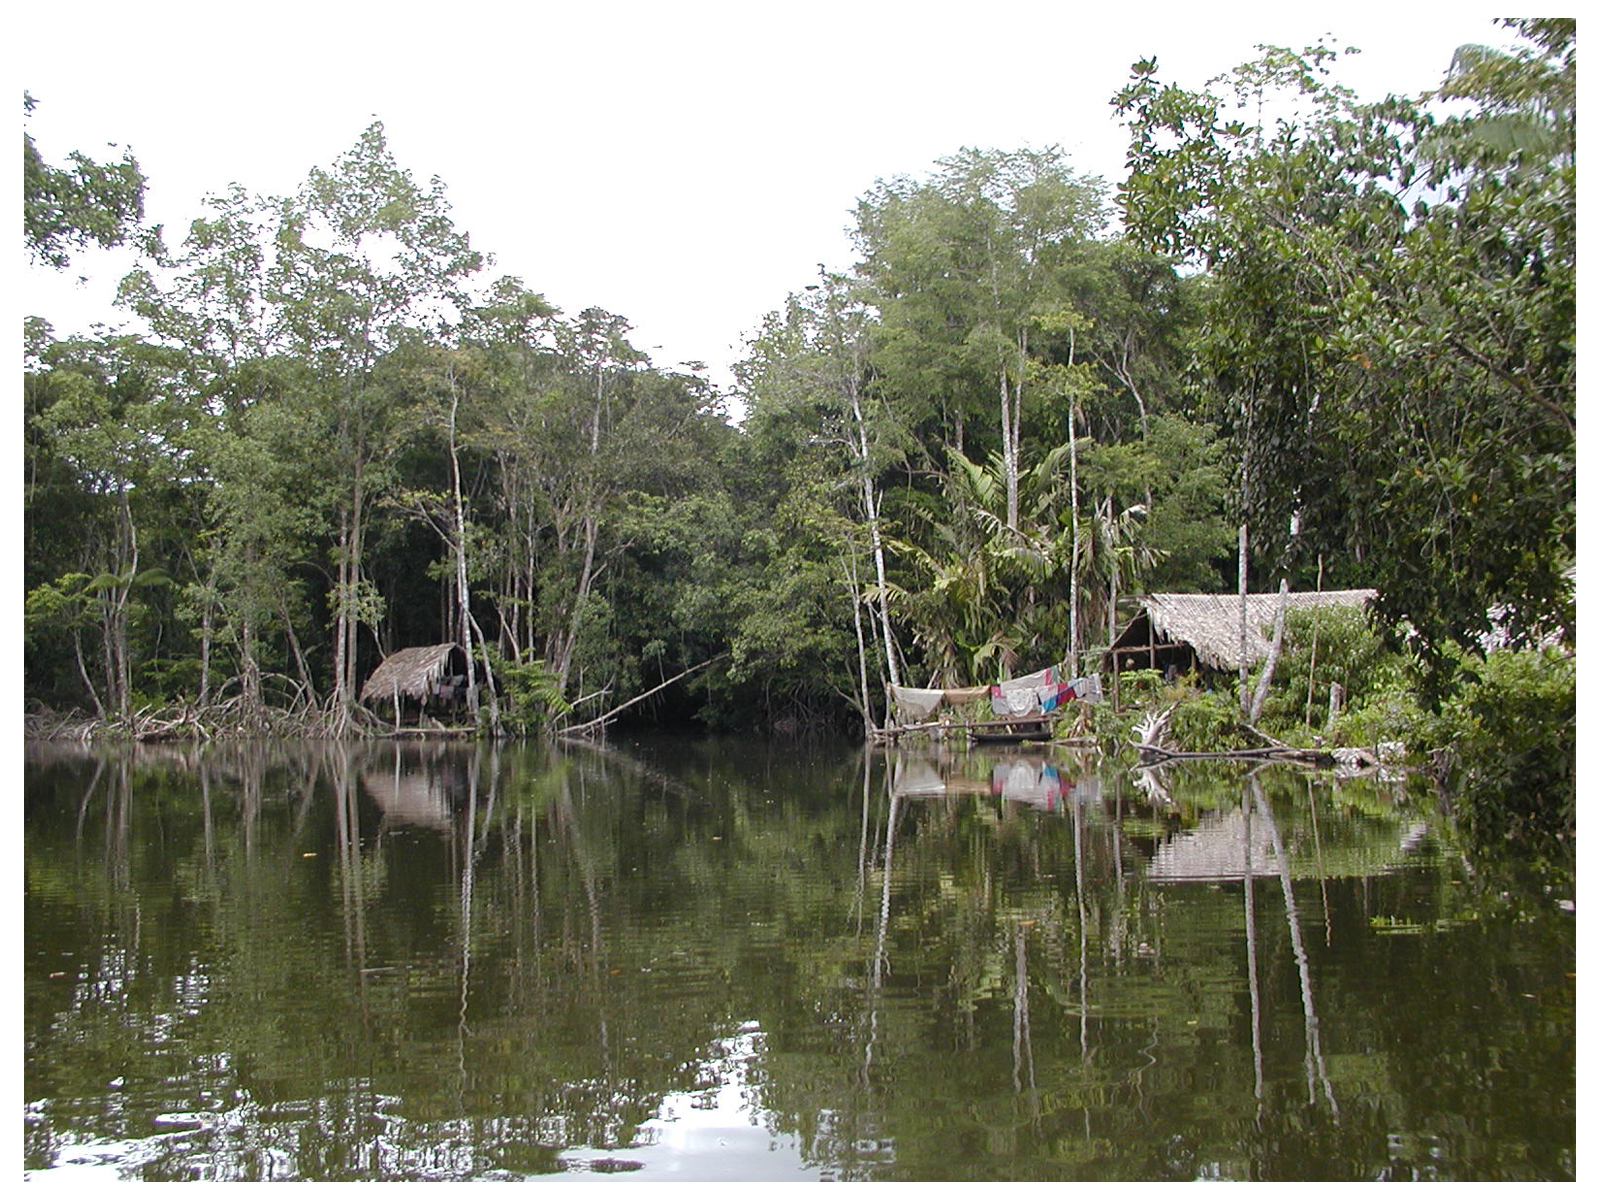 Warau Indian Huts, Orinocco Delta, Venezuela